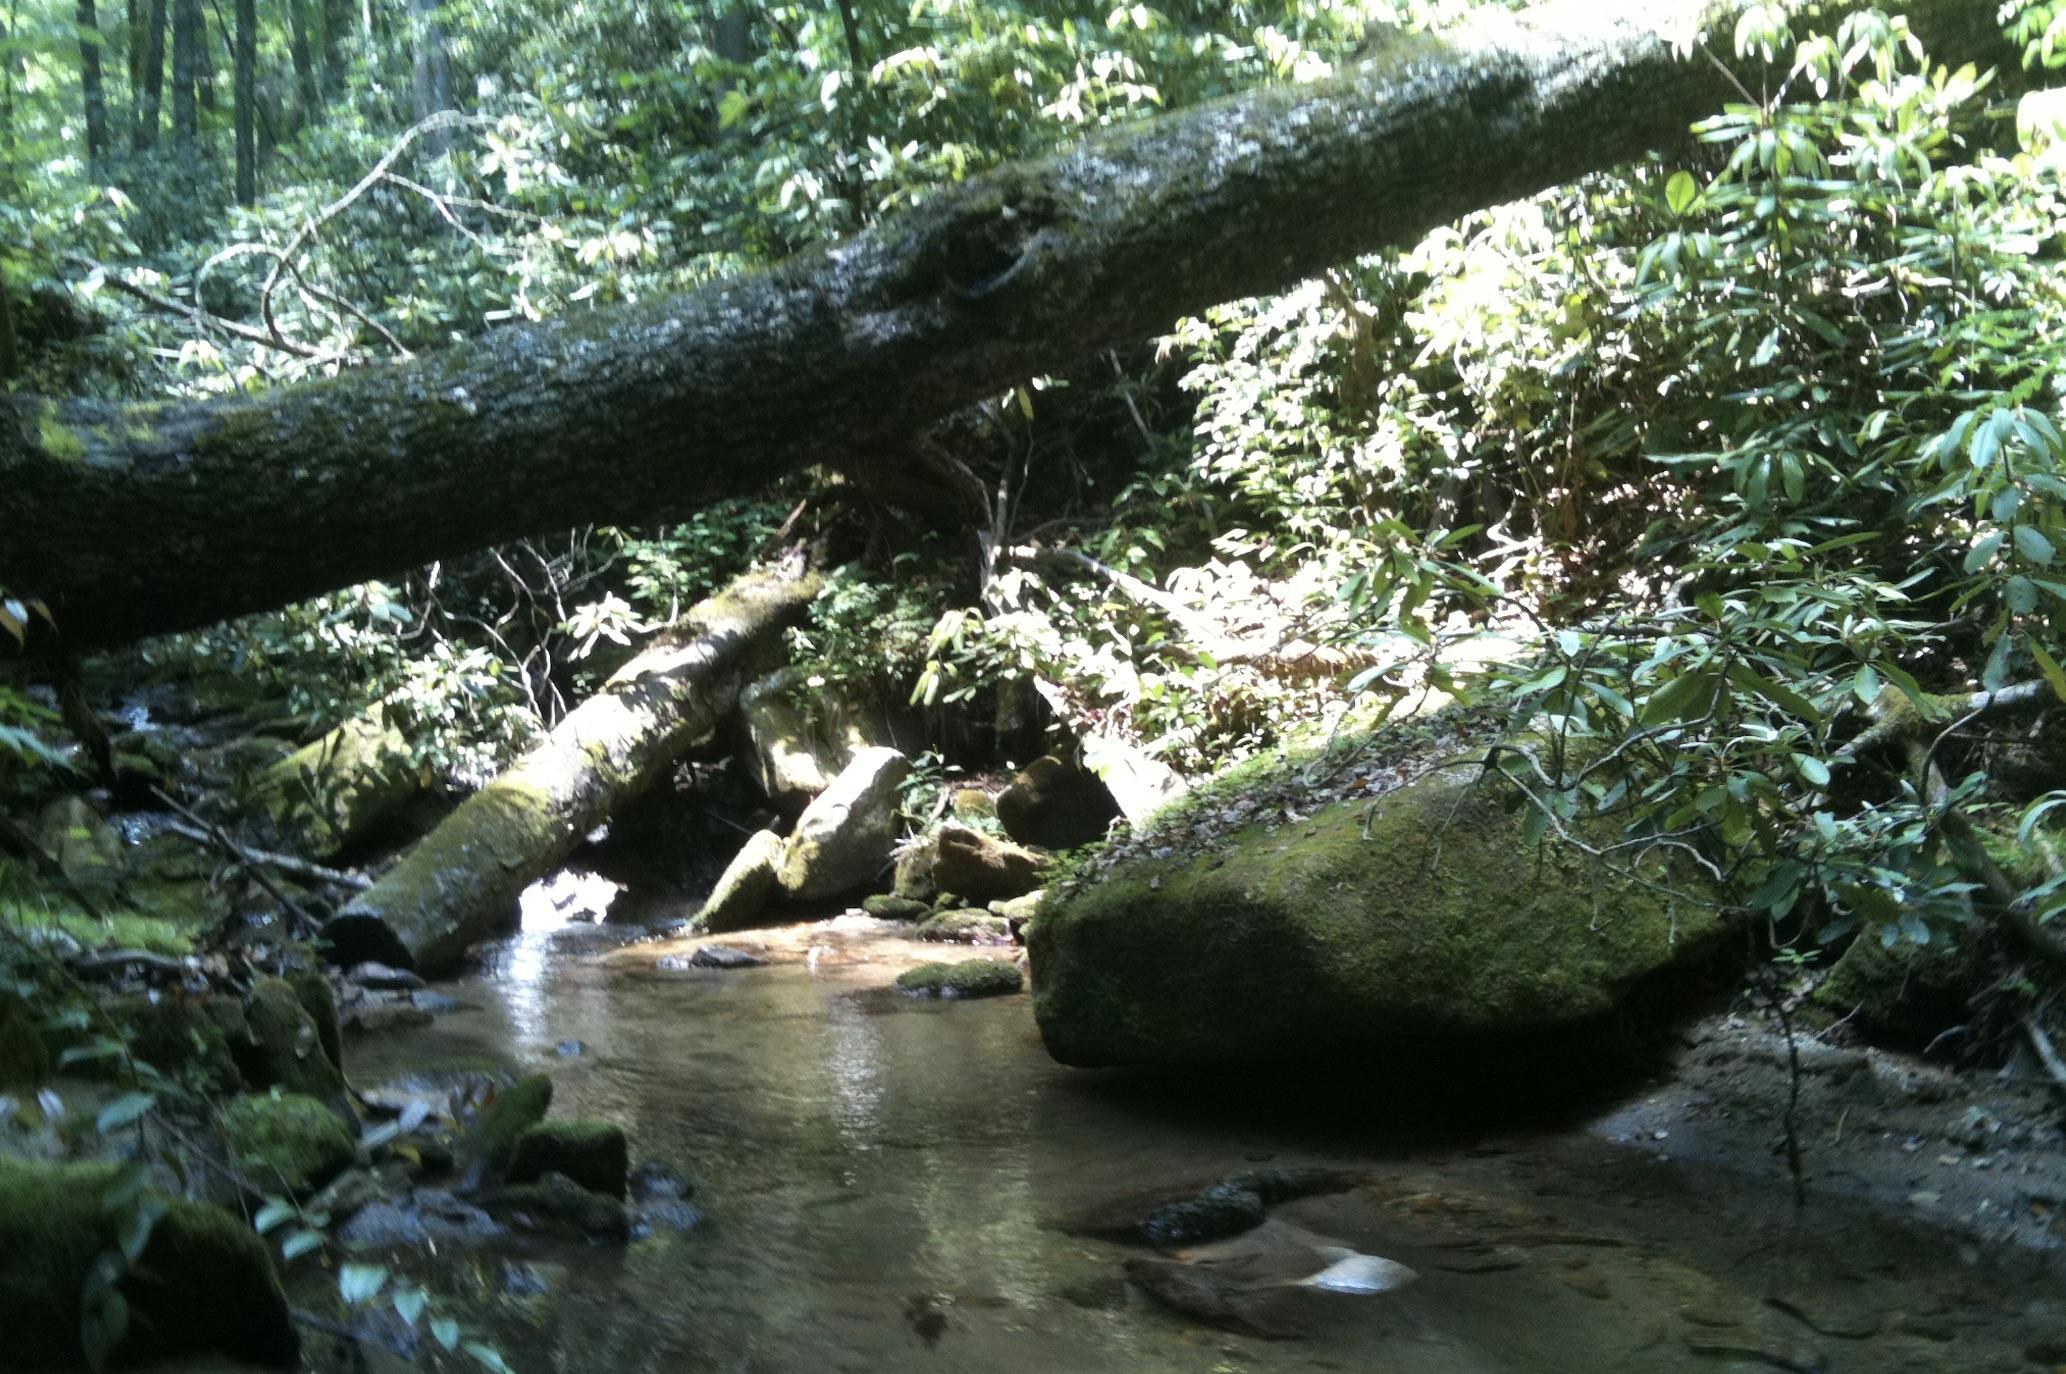 Appalachian creek